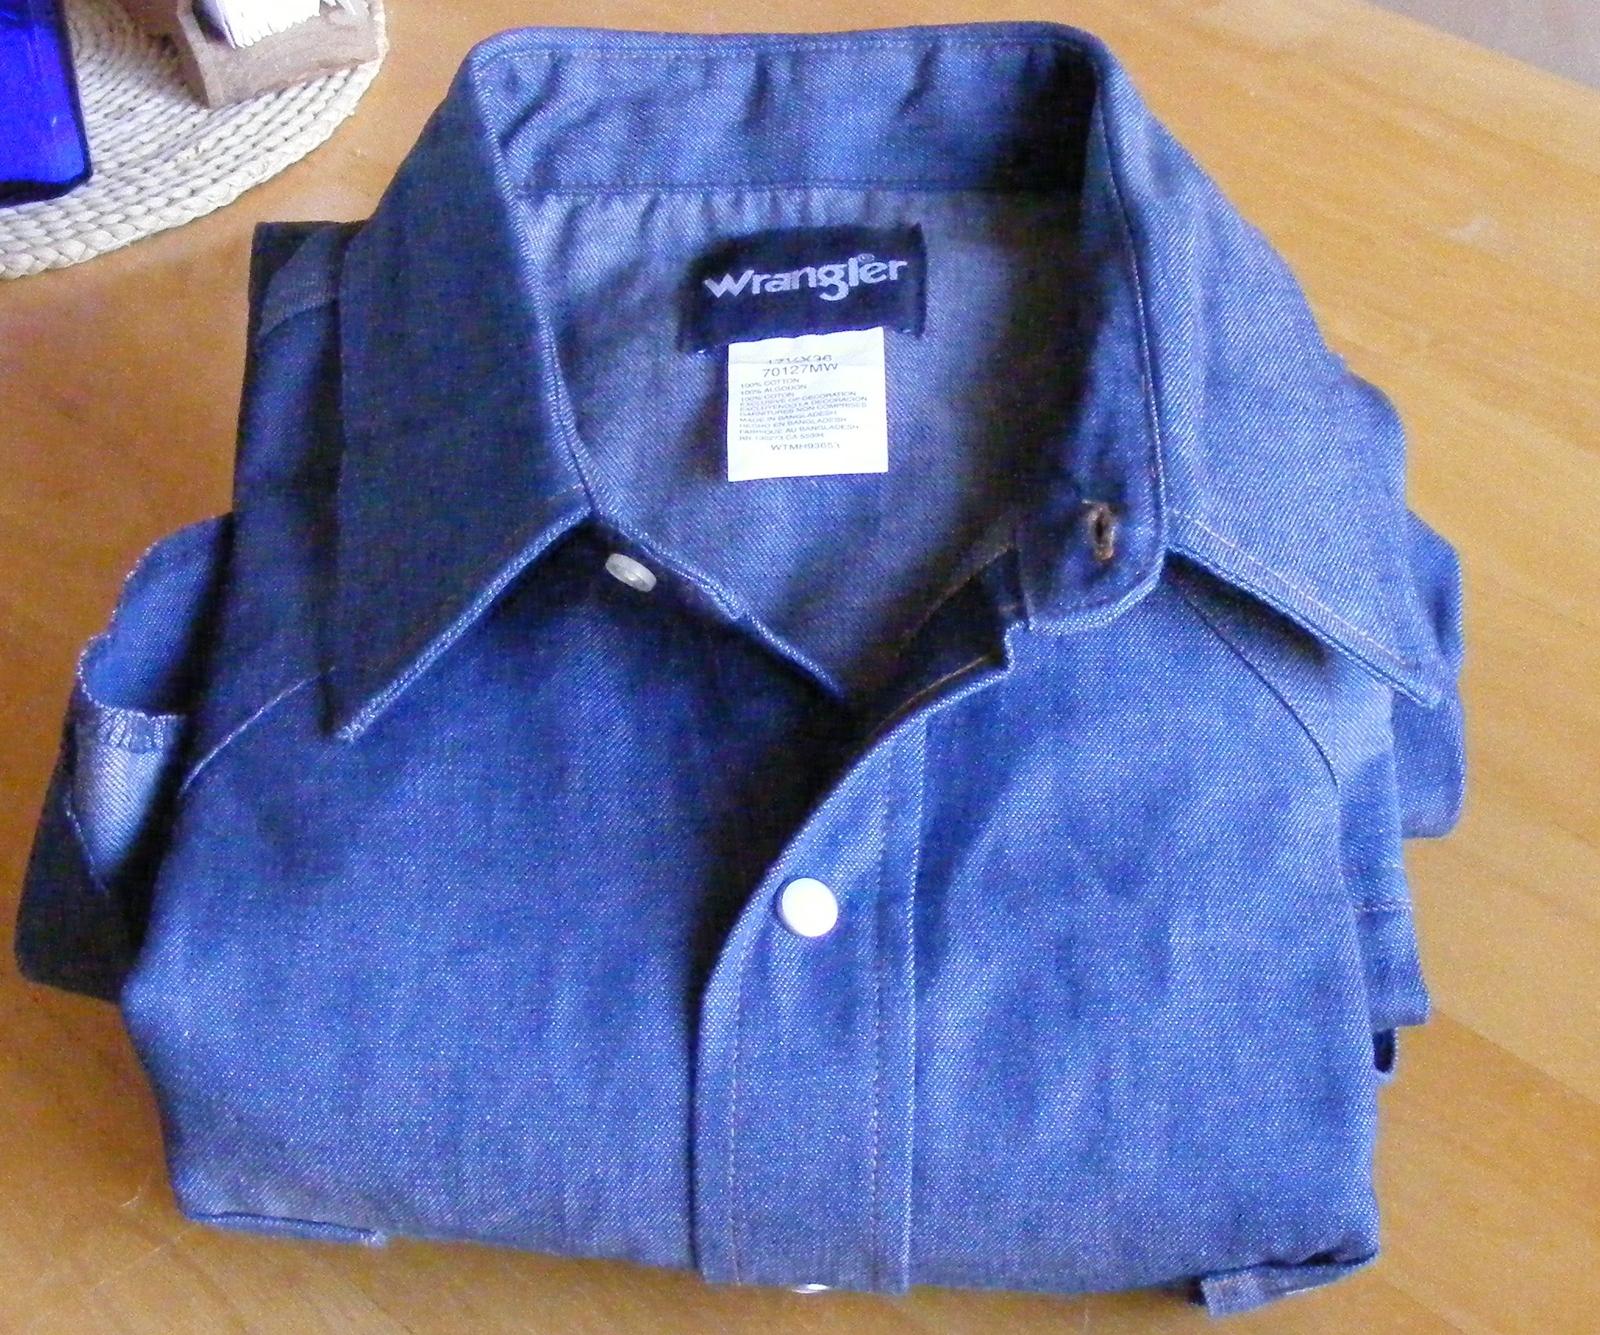 7ce6a05044 Dscf4342. Dscf4342. Previous. Wrangler Cowboy Cut rigid denim cotton work  shirt